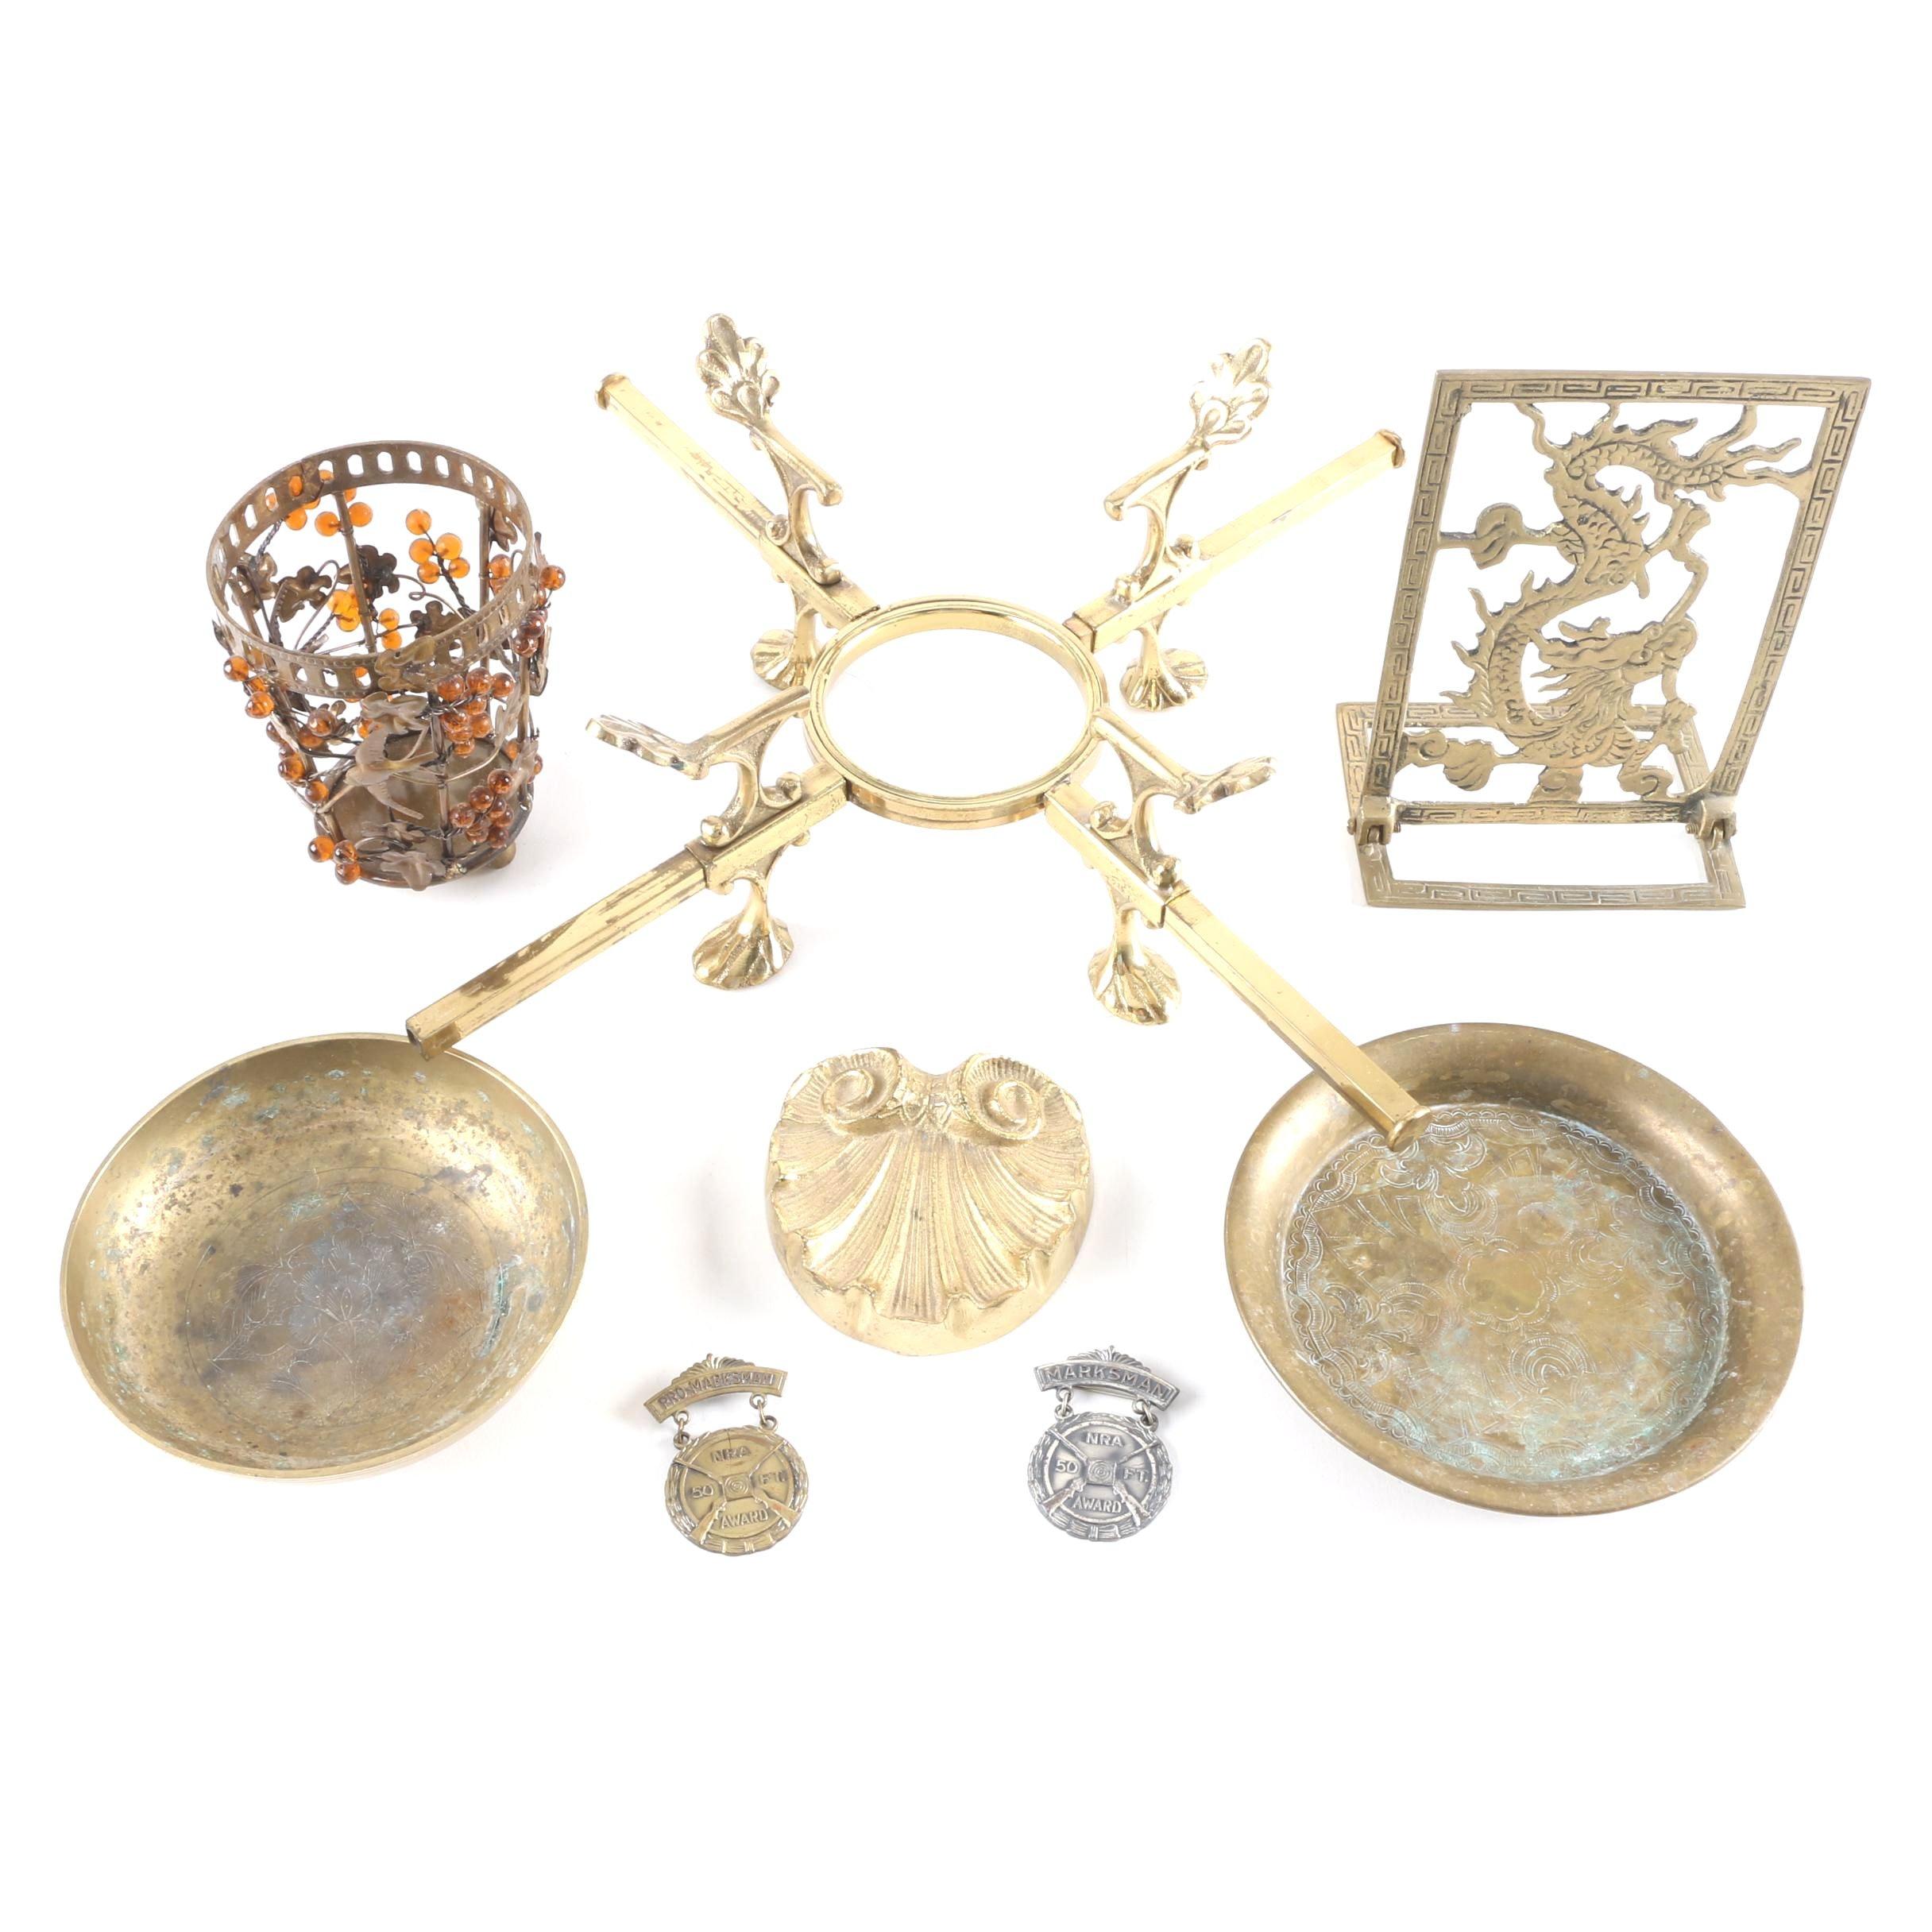 Assortment of Brass and Metal Decor